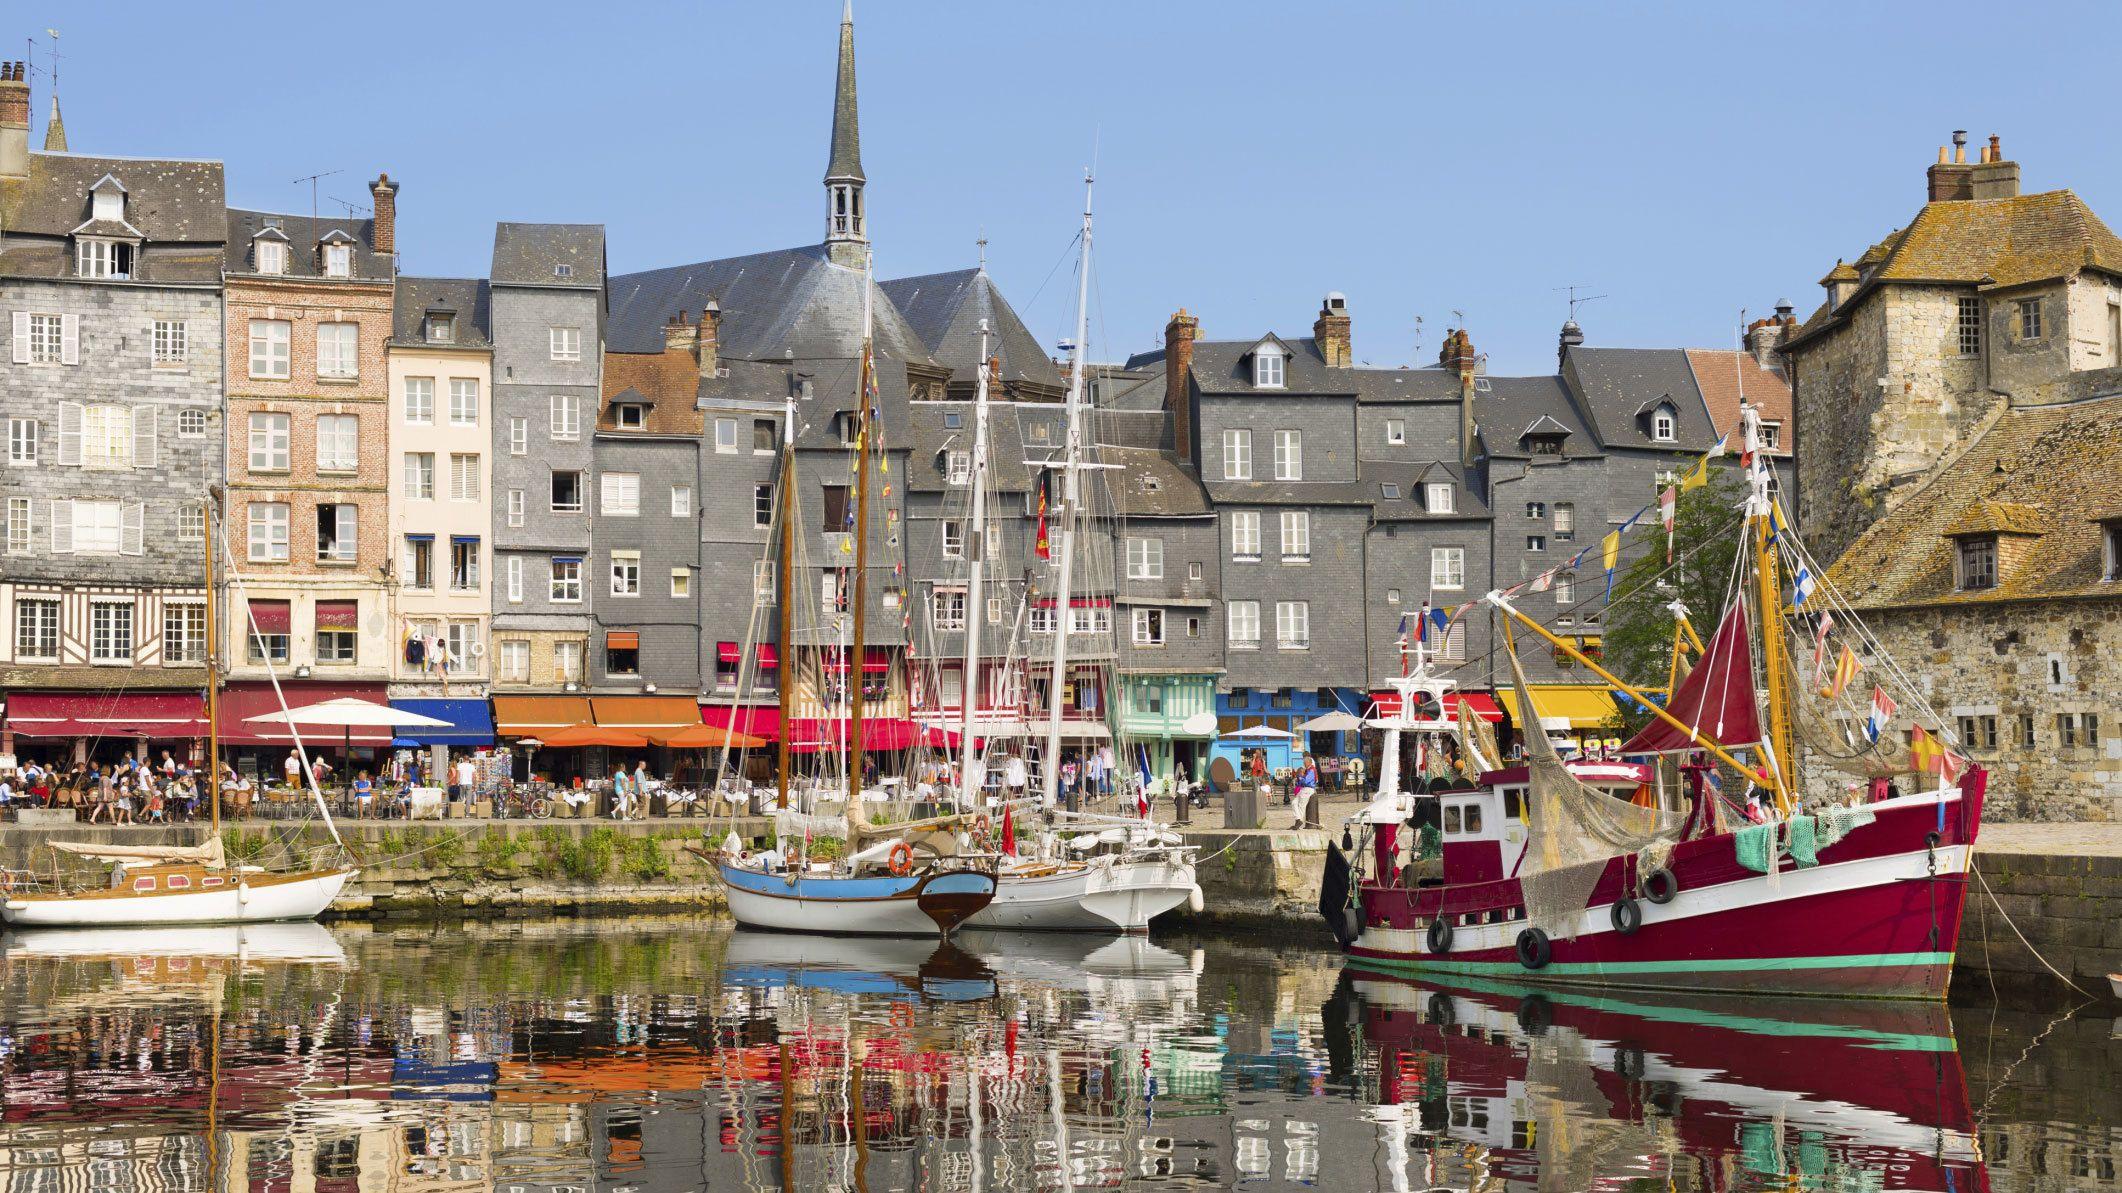 2-Day Tour: Normandy, St. Malo & Mont St. Michel